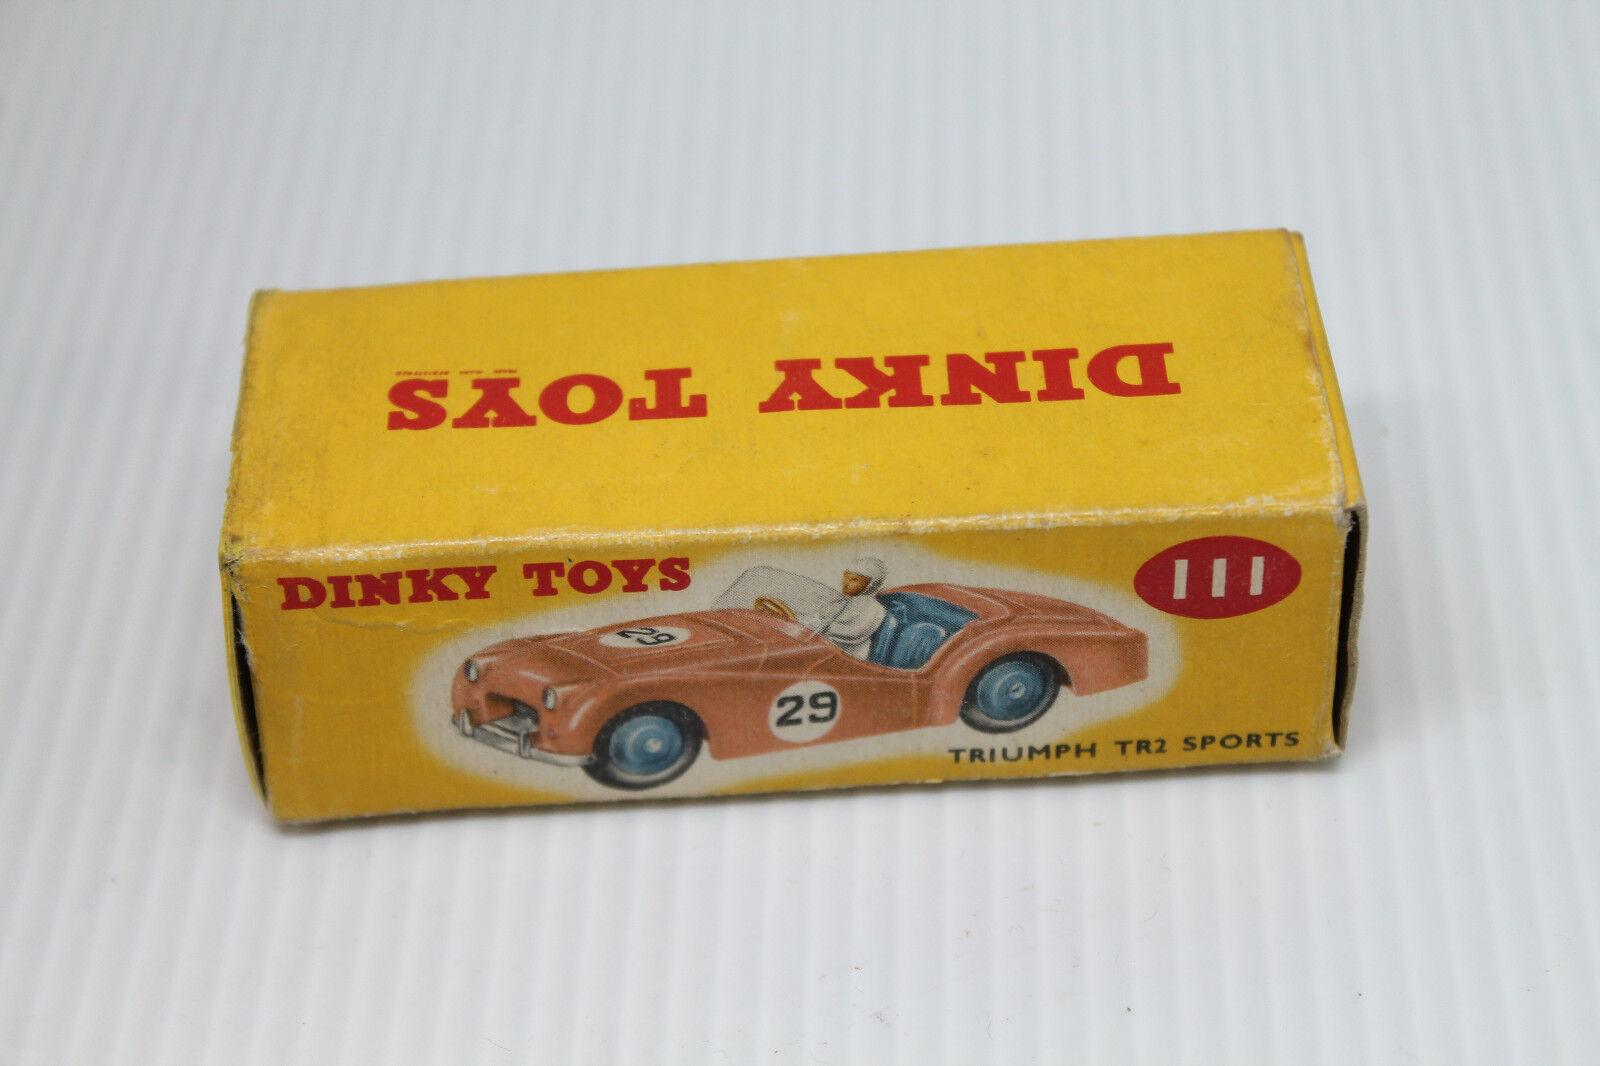 DINKY TOYS 111  Triumph tr2 sports sports sports car  Neuf dans sa boîte  1:43  1956 | Dans Plusieurs Styles  859cc1